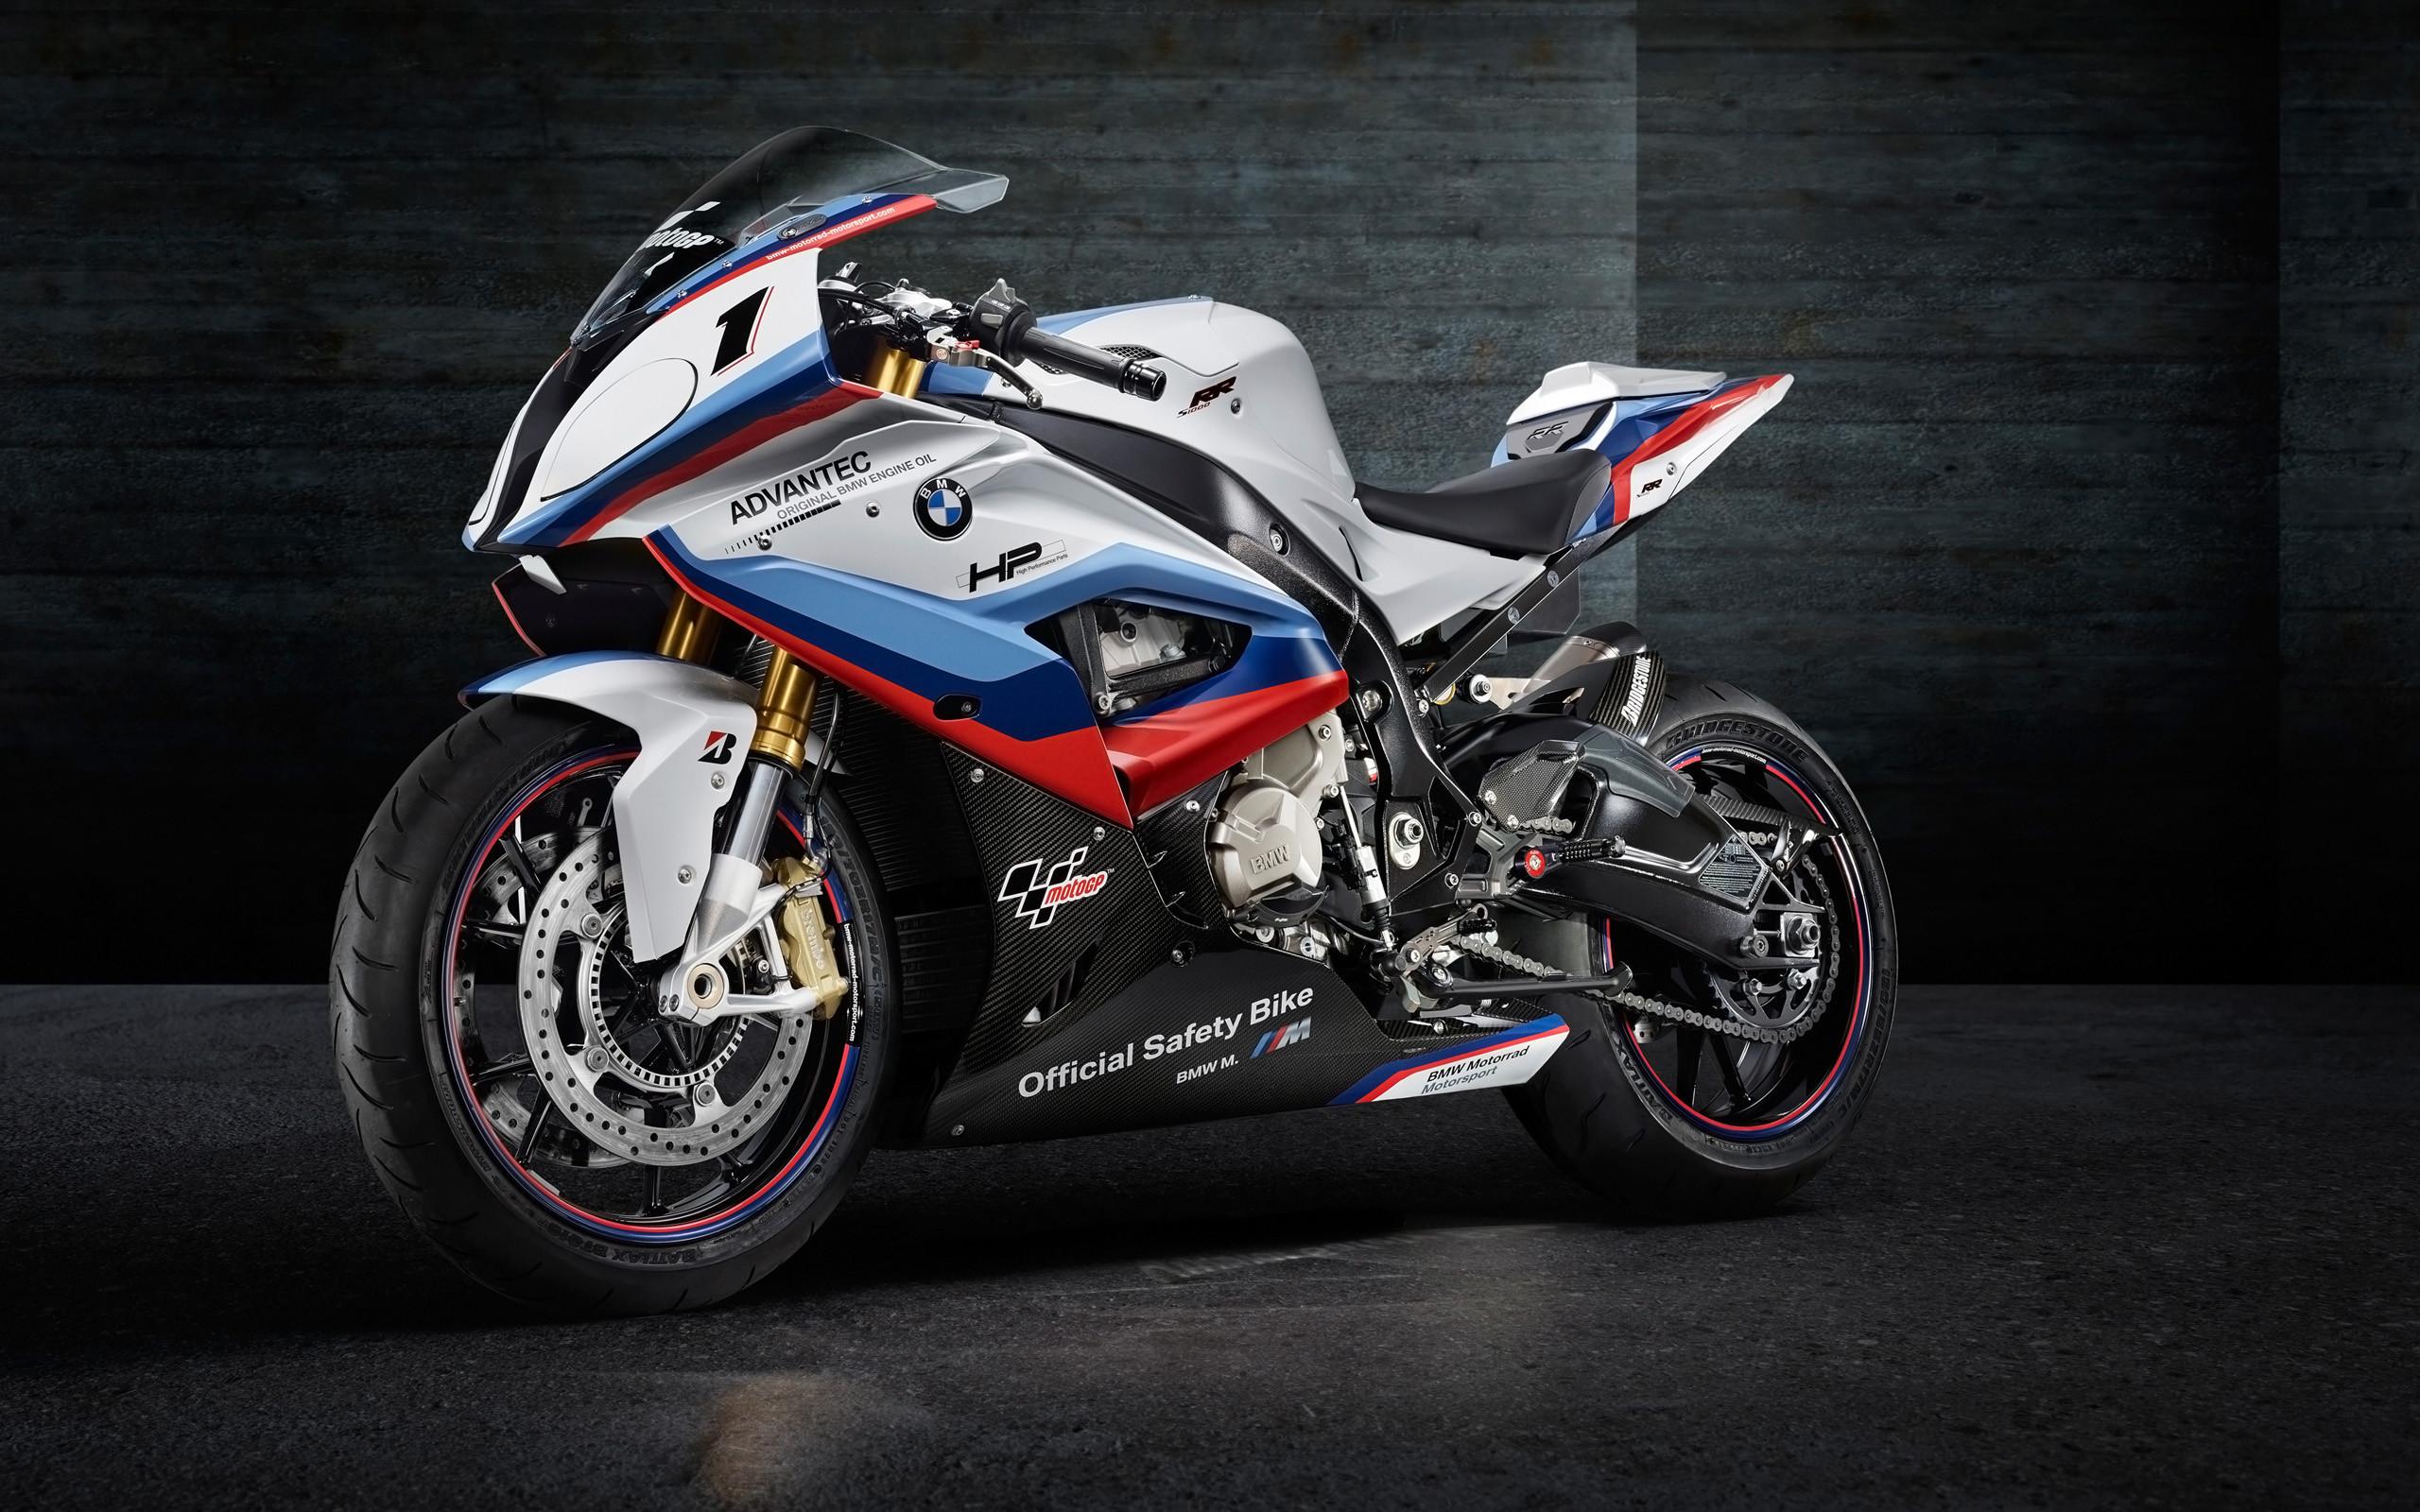 2015 BMW M4 MotoGP Safety Bike